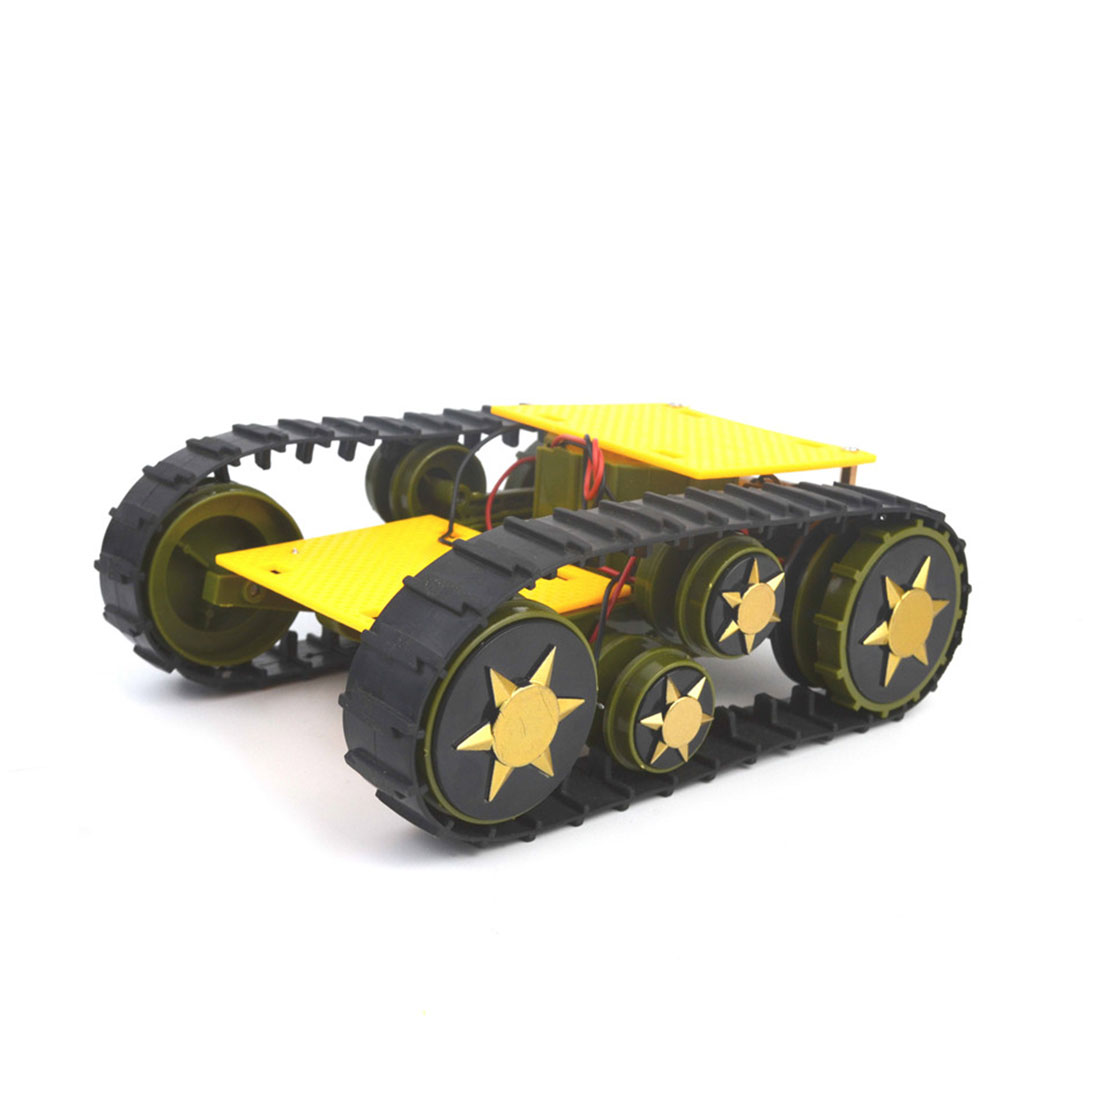 DIY Deformation Smart Tank Robot Crawler Caterpillar Vehicle Platform For Arduino SN1900 For Child Educational Toy Birthday Gift